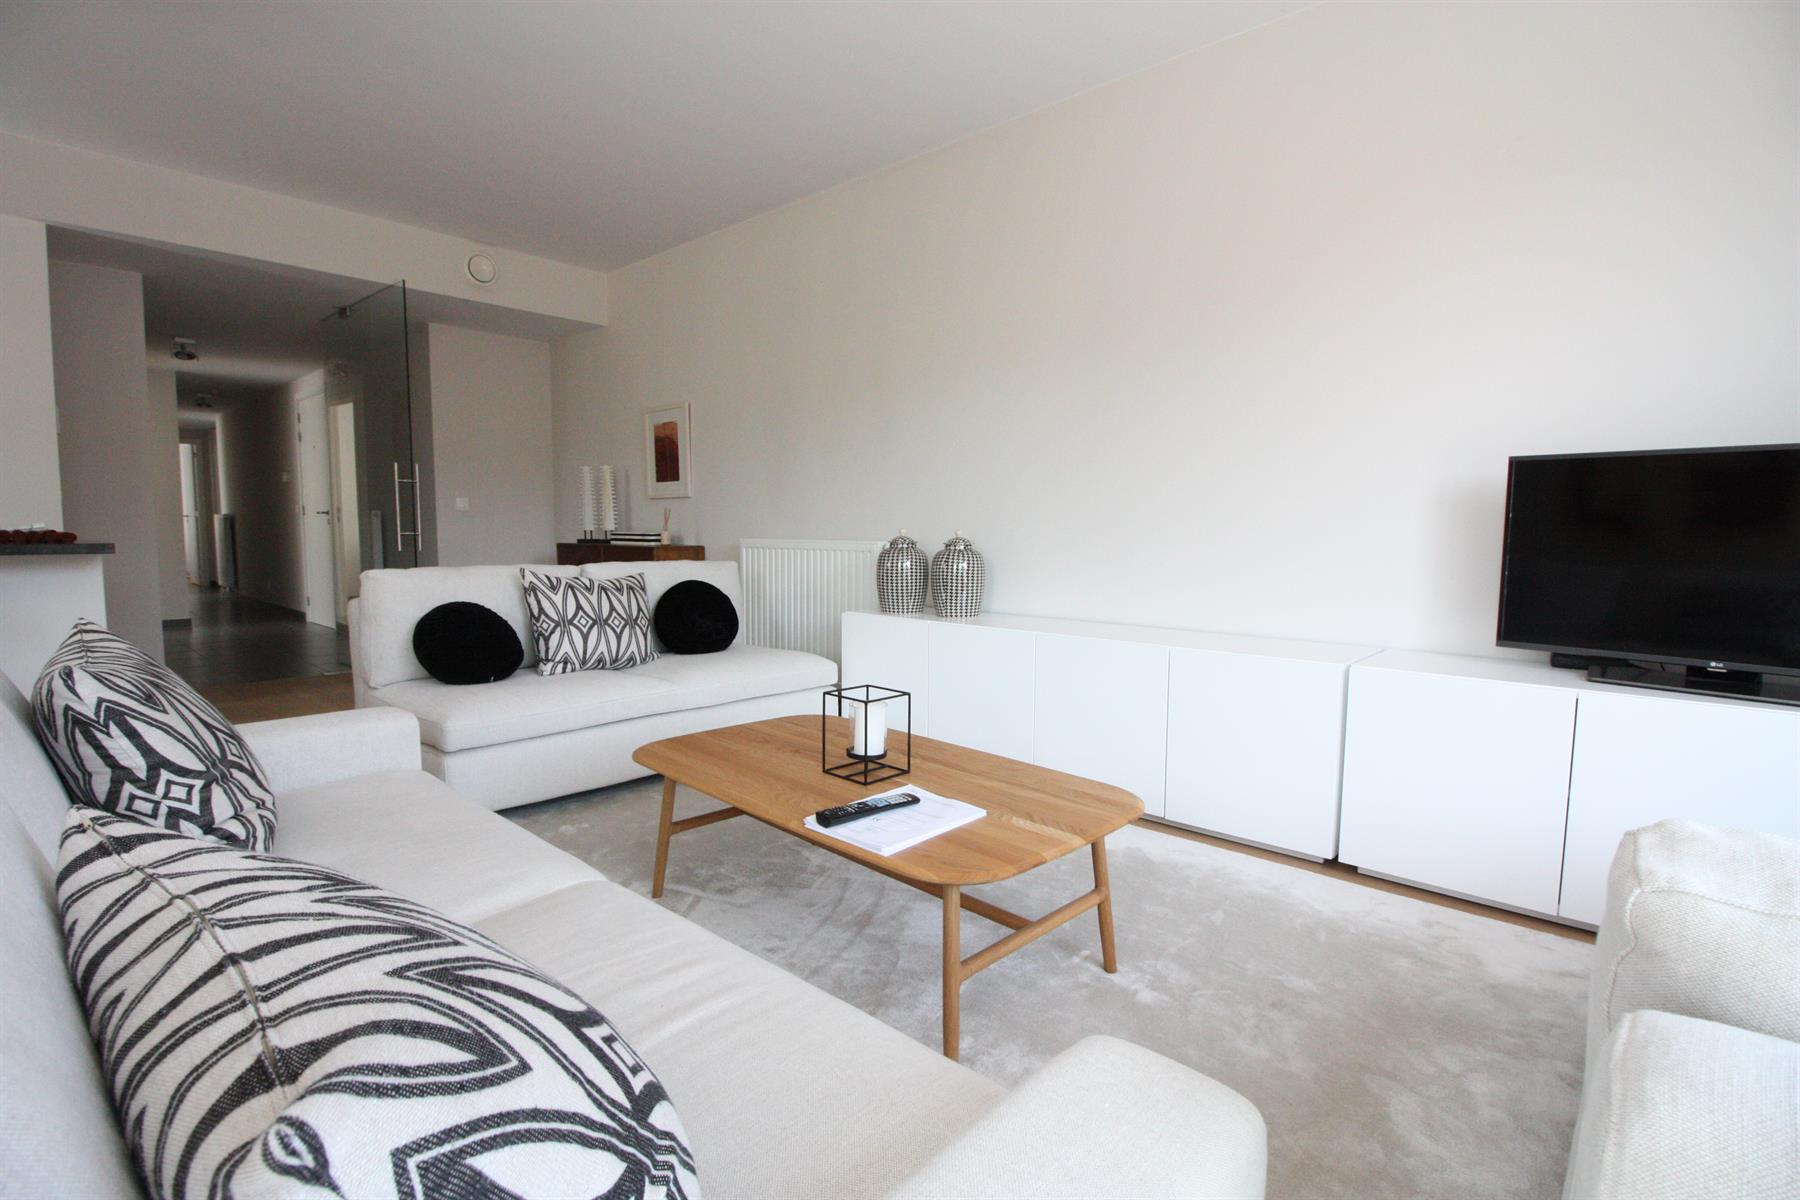 Flat - Etterbeek - #3978340-1